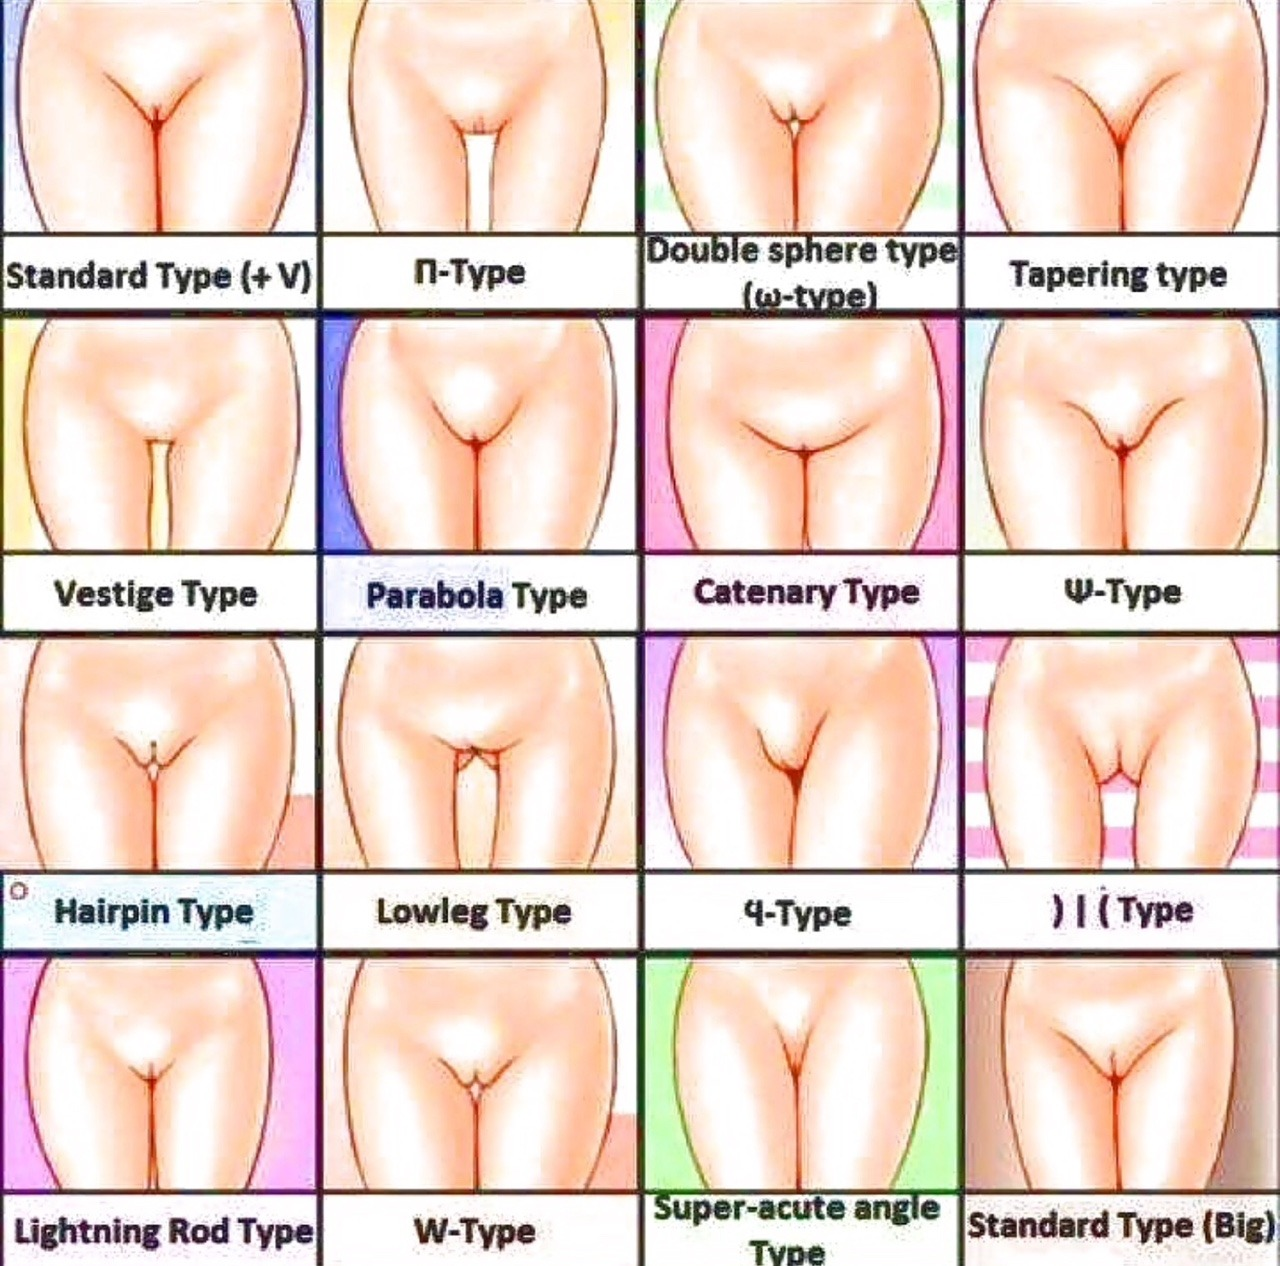 vagina, types of vagina, பிறப்புறுப்பு, பெண்களின் பிறப்புறுப்பு வகைகள்,